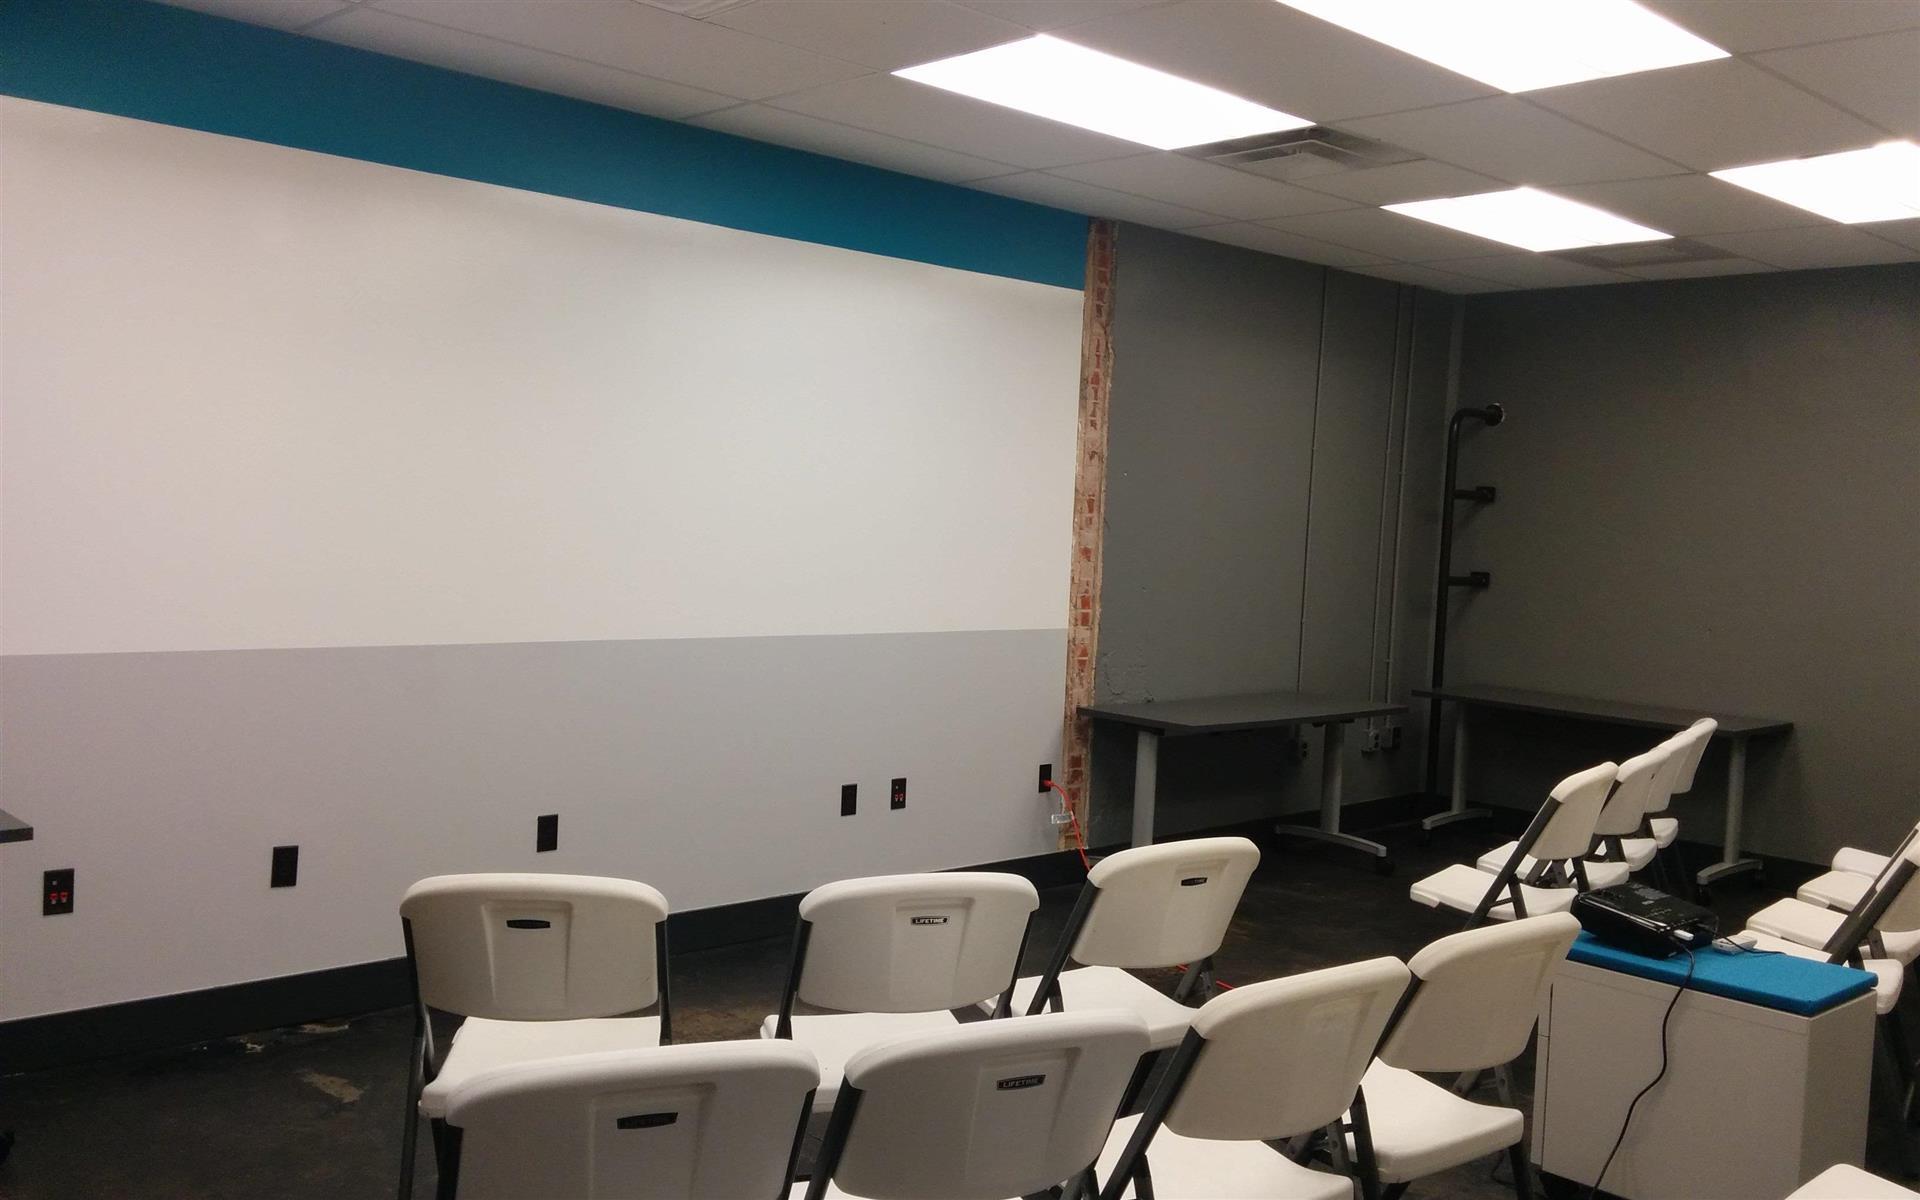 The Exchange - The Classroom